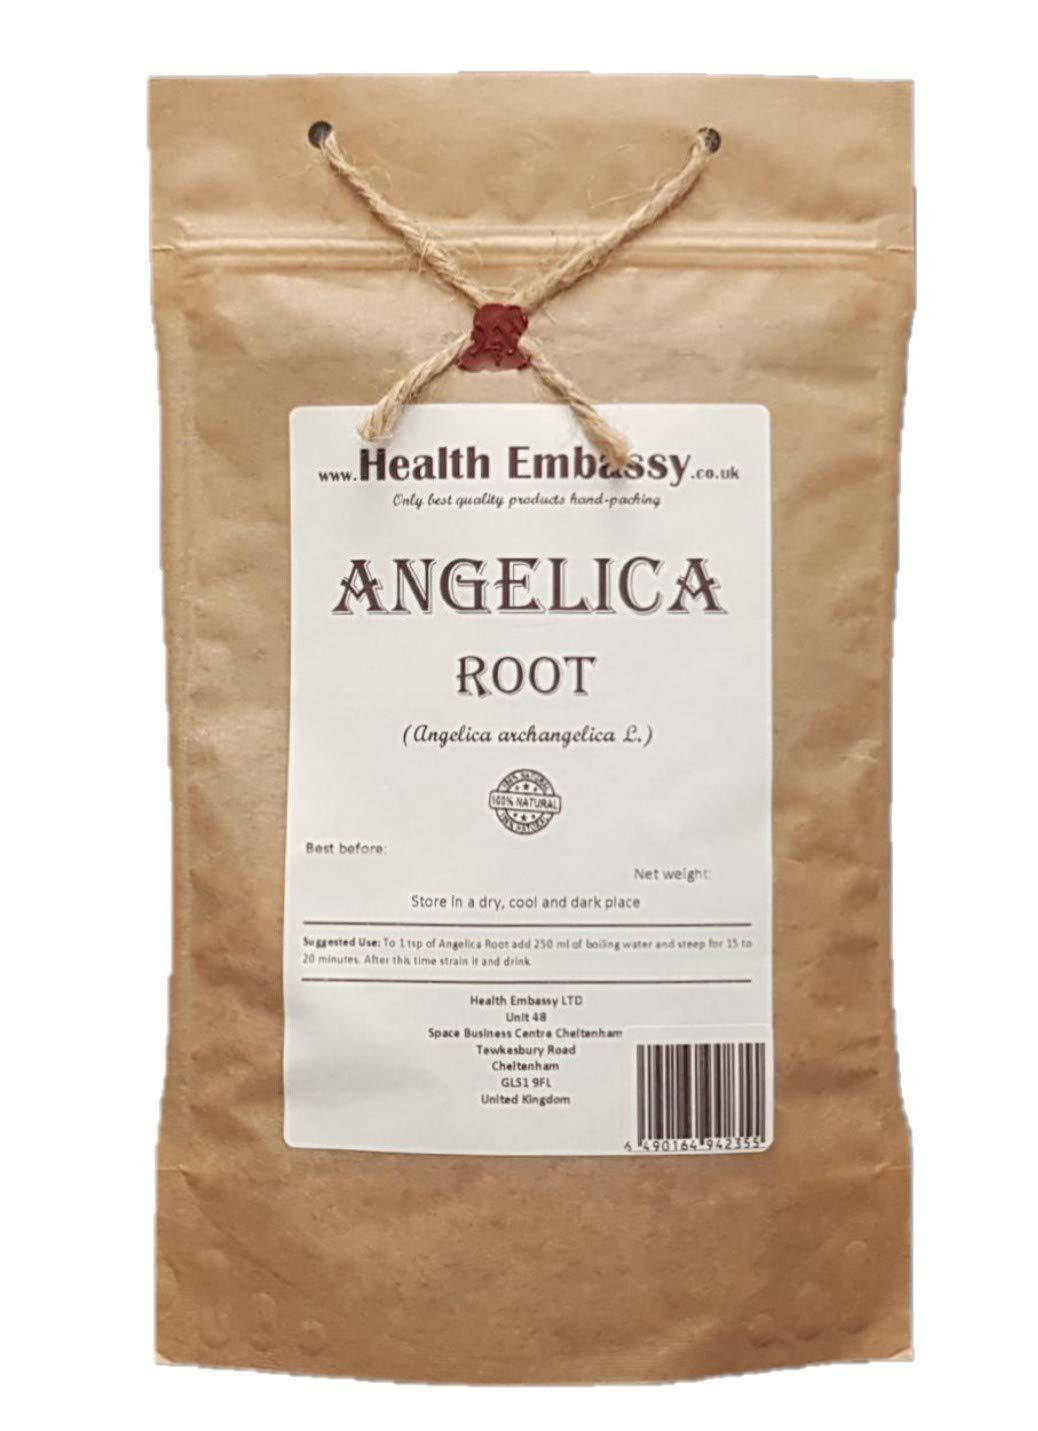 Angelica Root (Angelica archangelica L. - Radix Archangelicae) - Health Embassy - 100% Natural (50g)